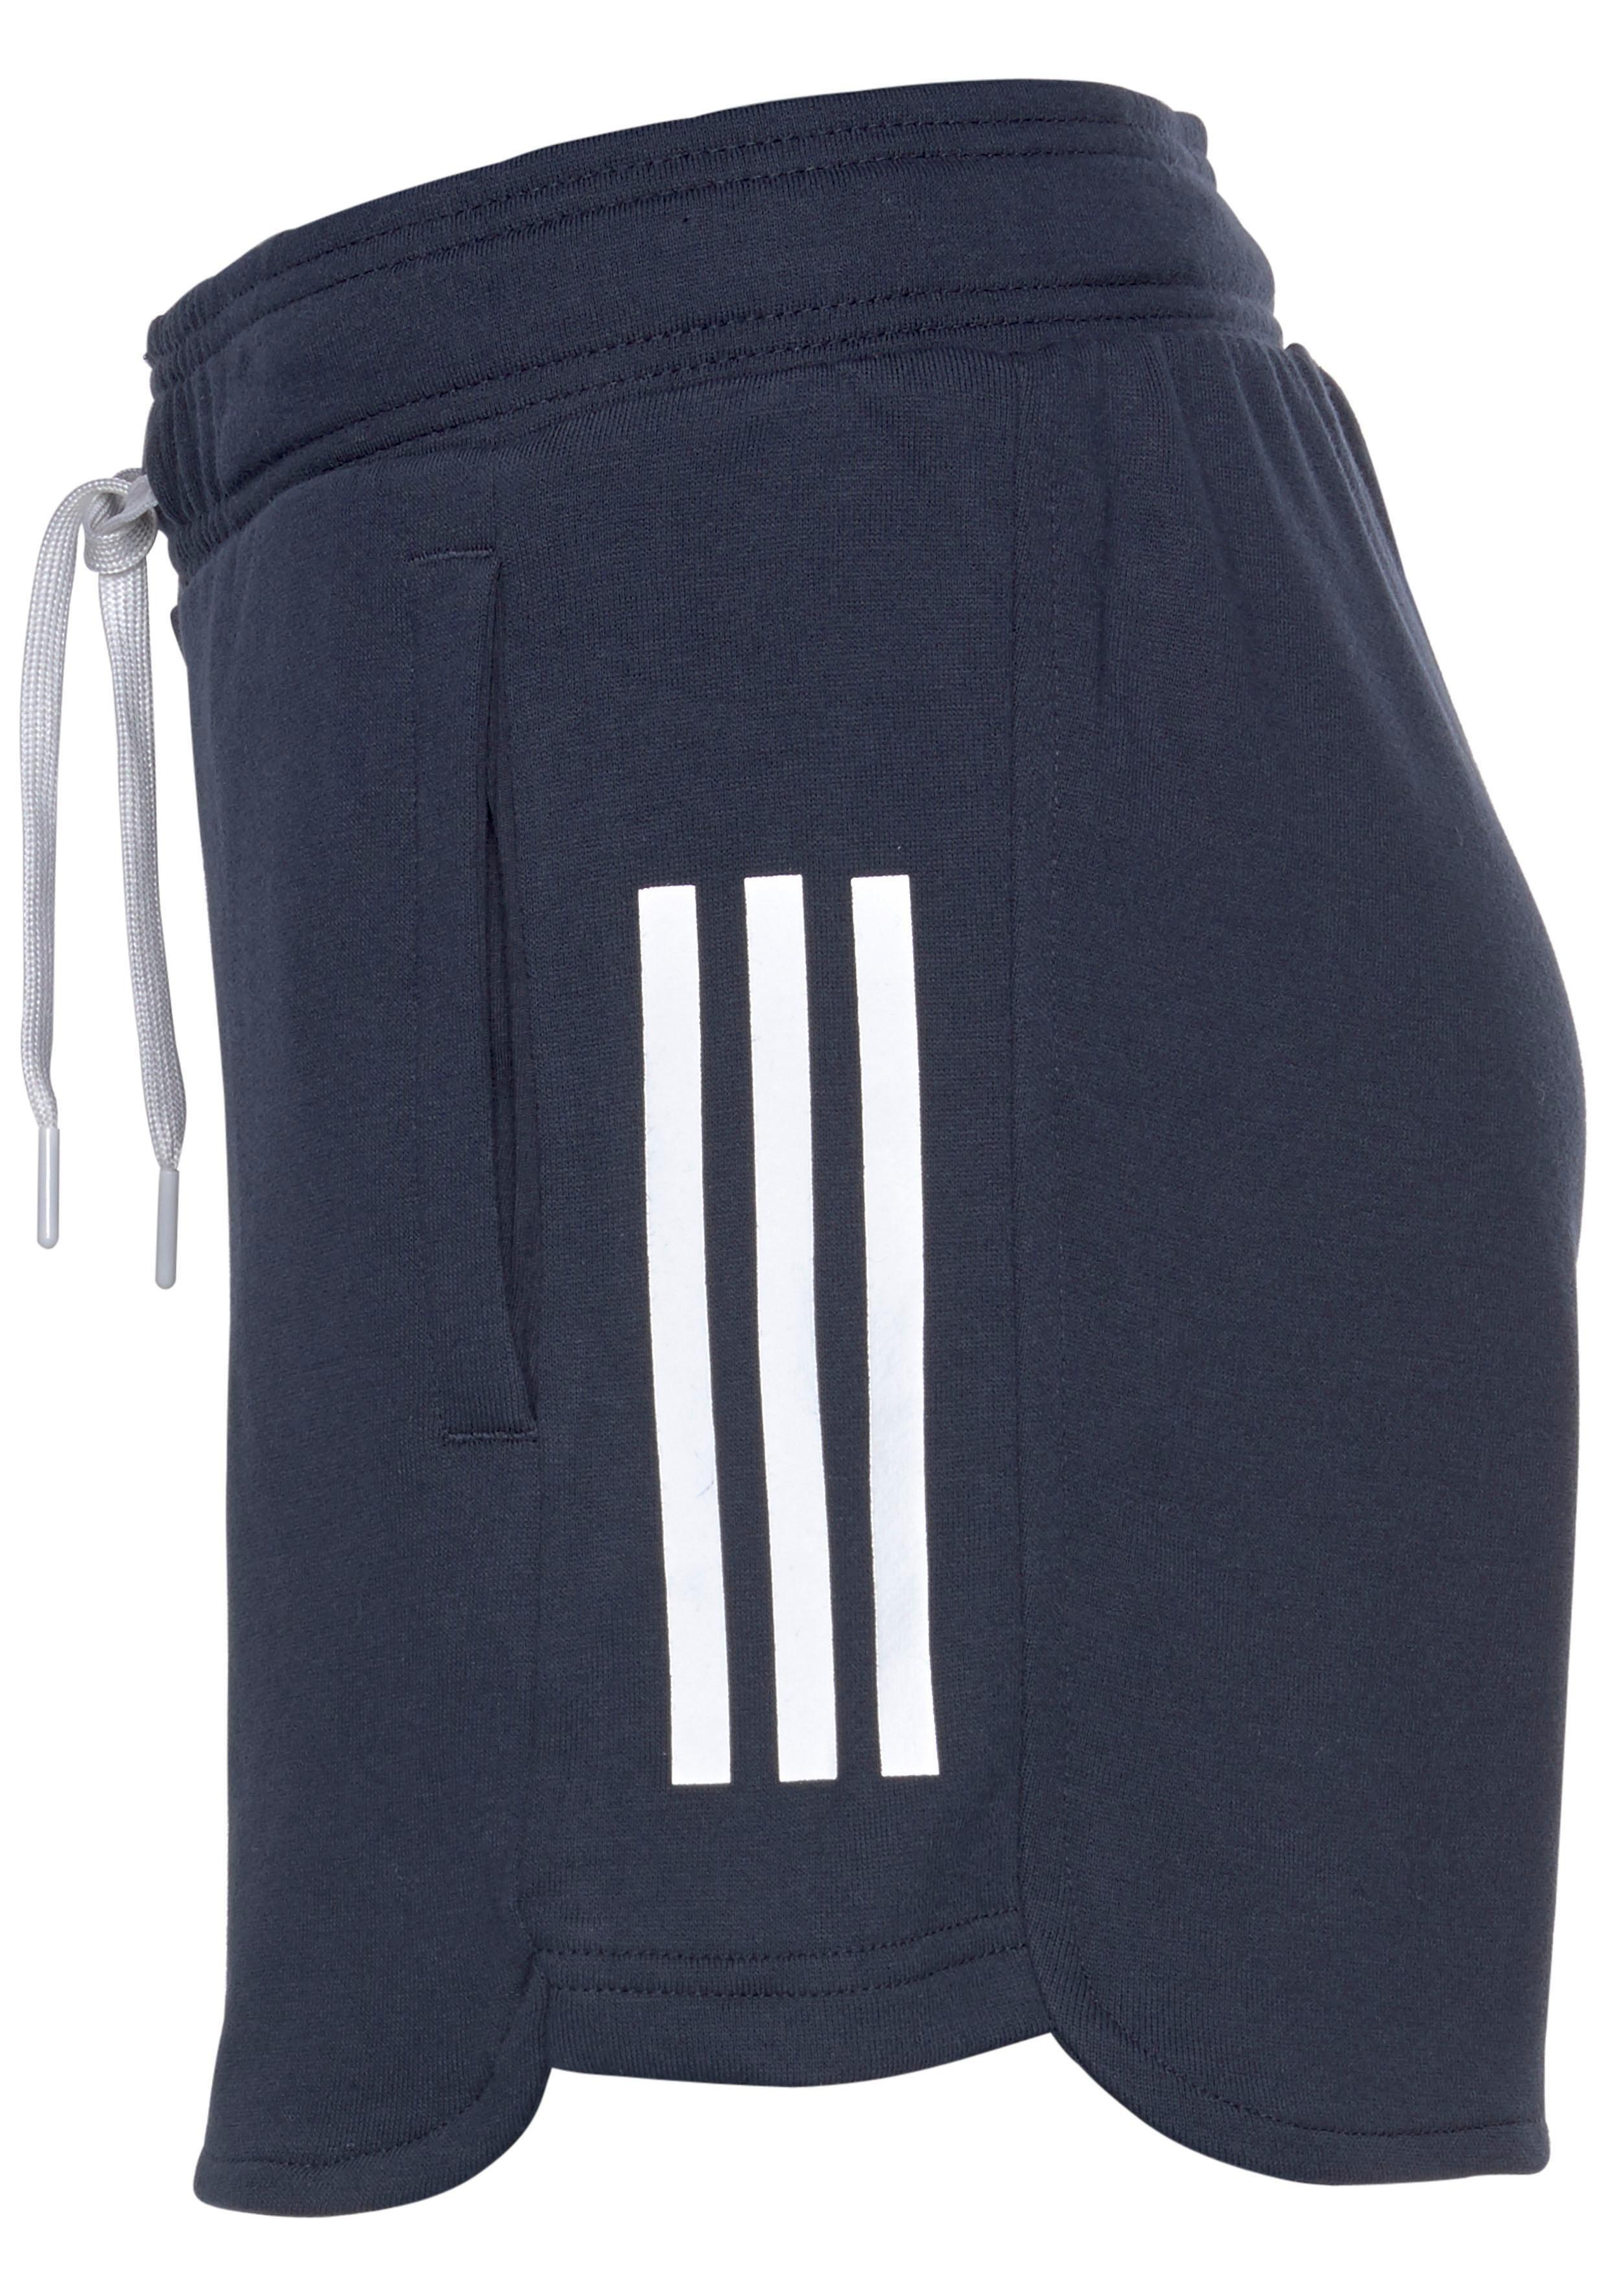 Adidas Short Kopen Nu Shortw Sid Online Performance FcKl1TJ